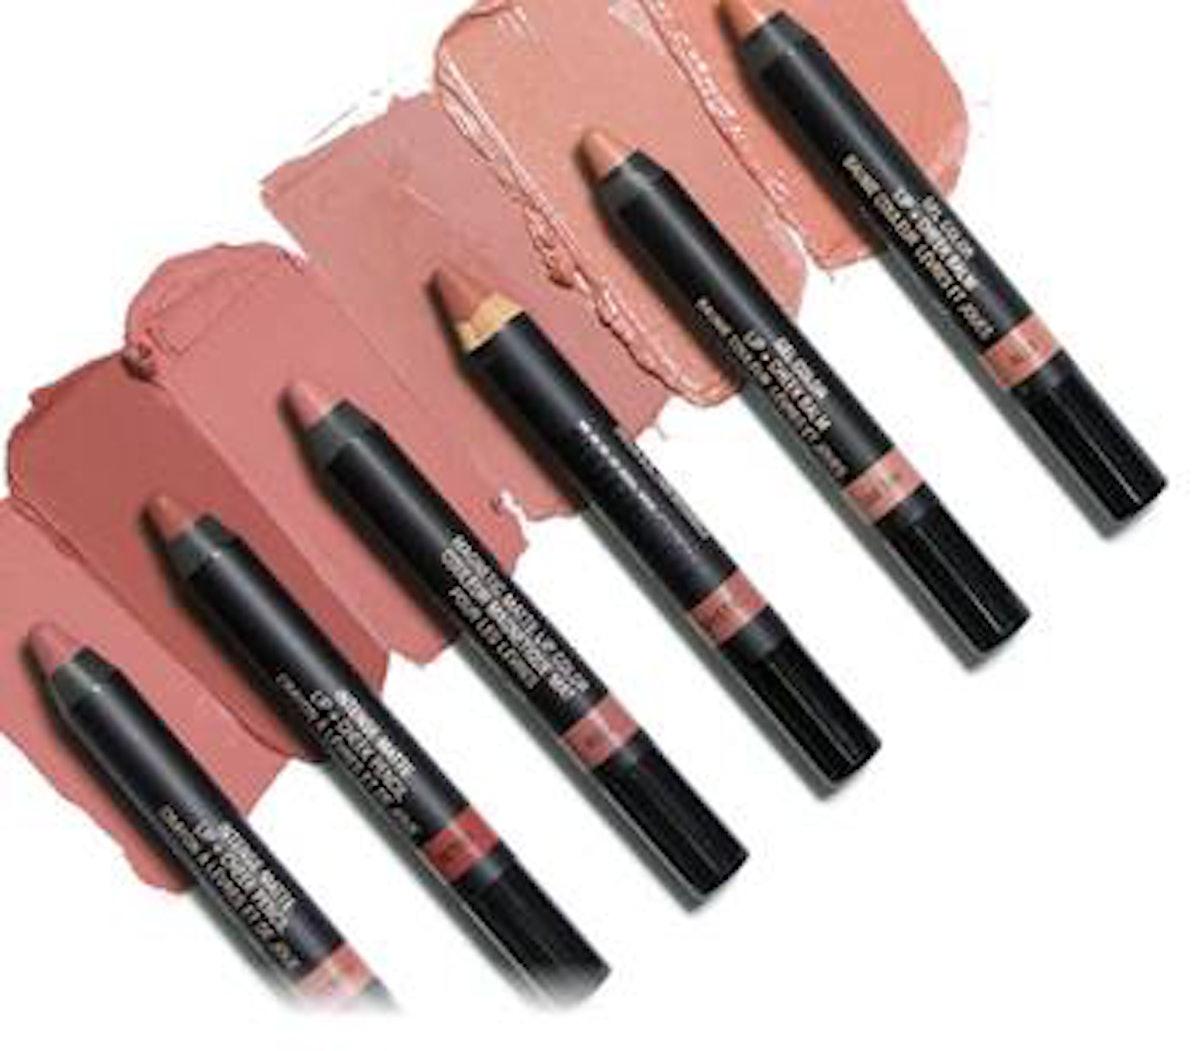 Nudestix Bebe Pinks Lip Kit